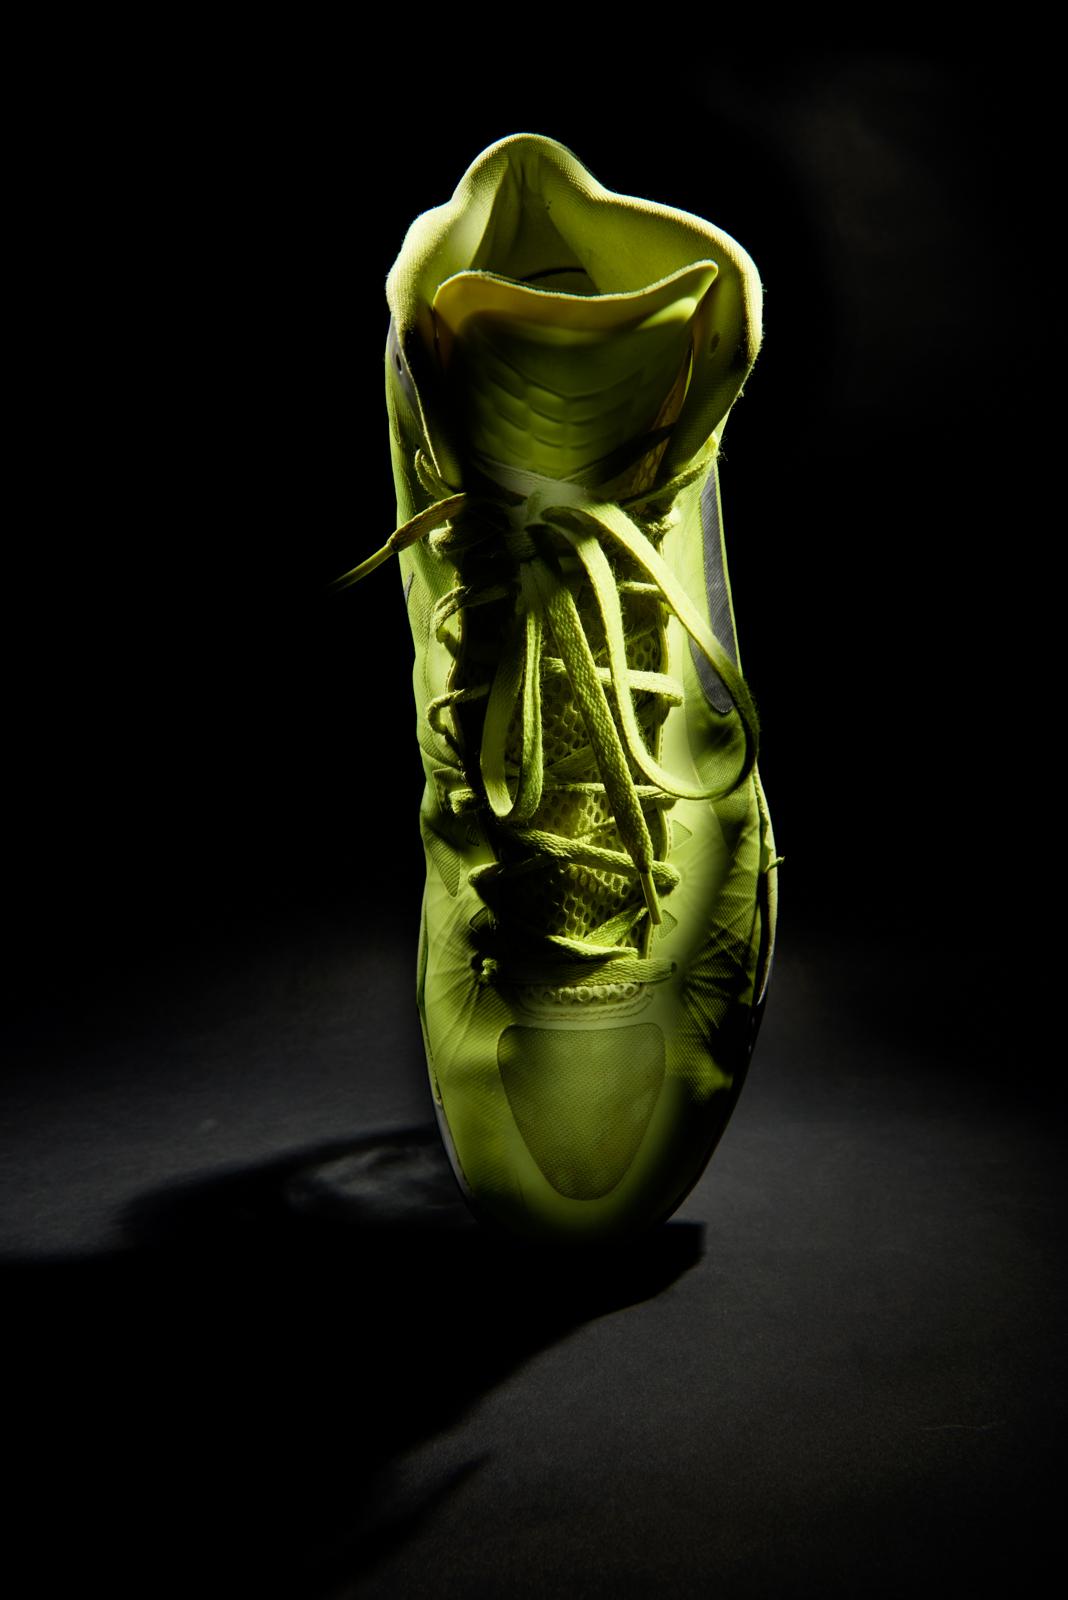 shoes_006.jpg